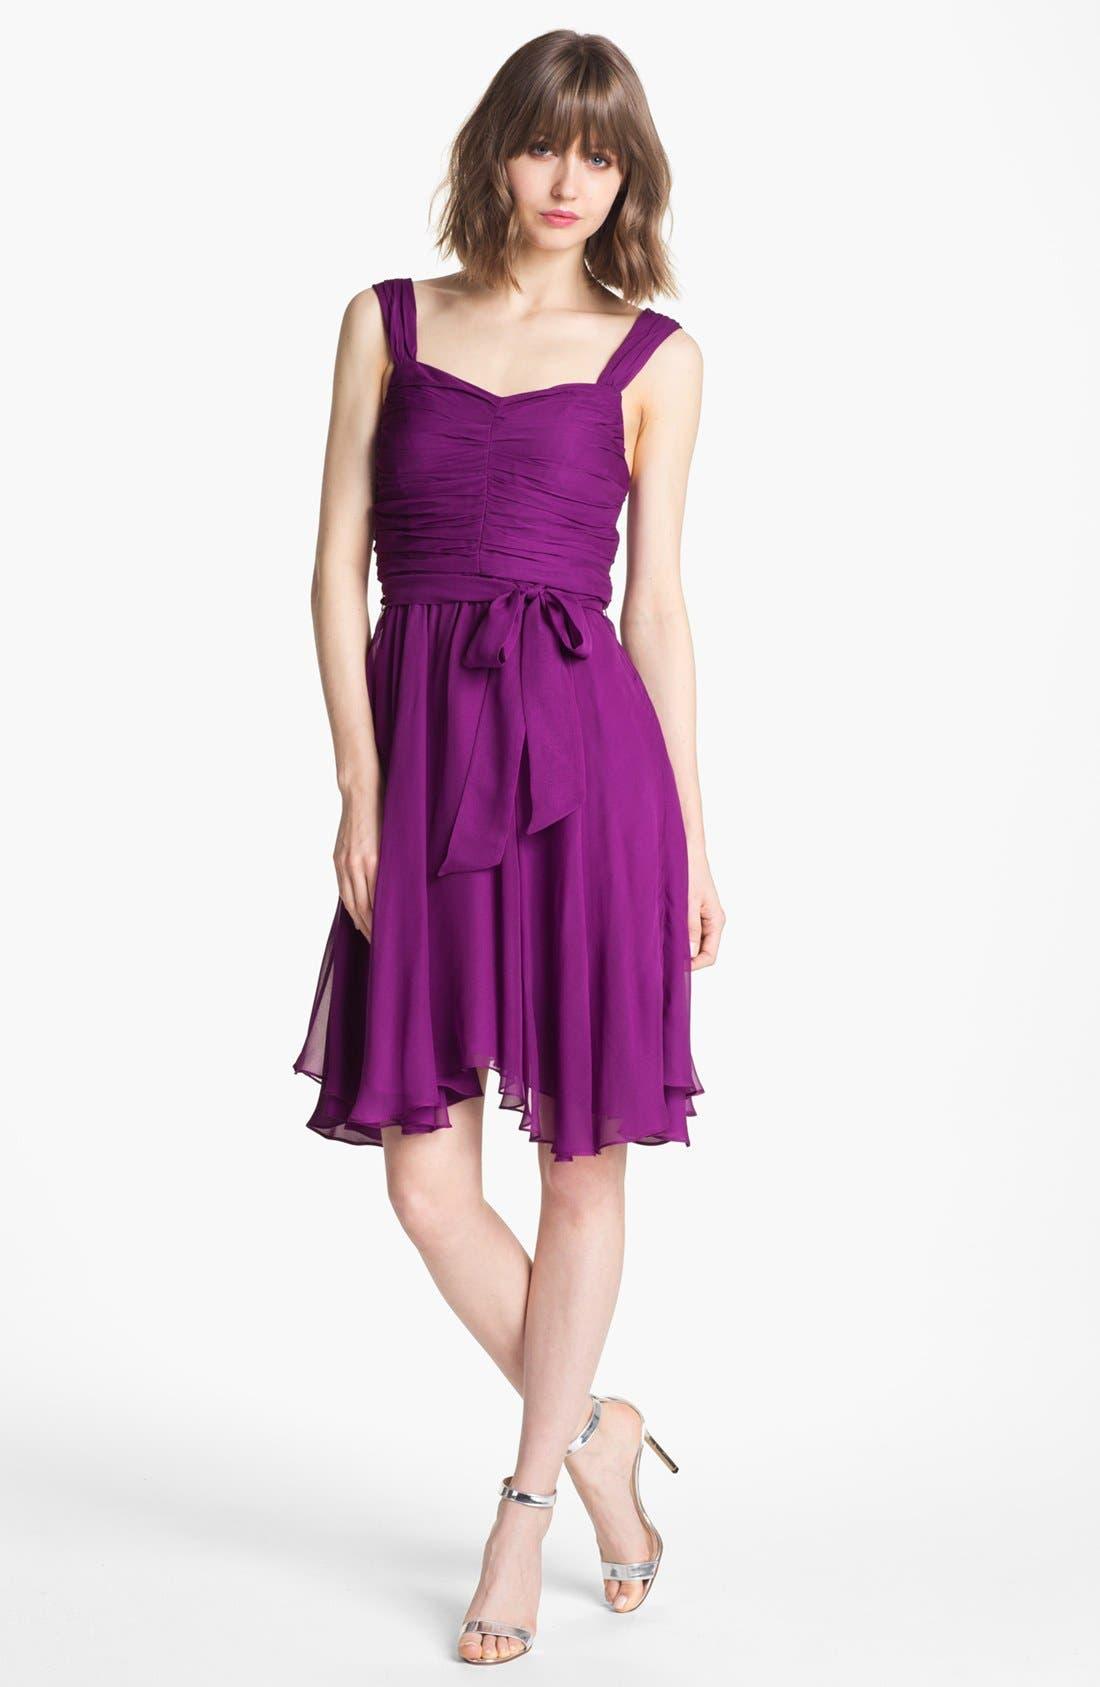 Alternate Image 1 Selected - Ivy & Blu Ruched Chiffon Dress